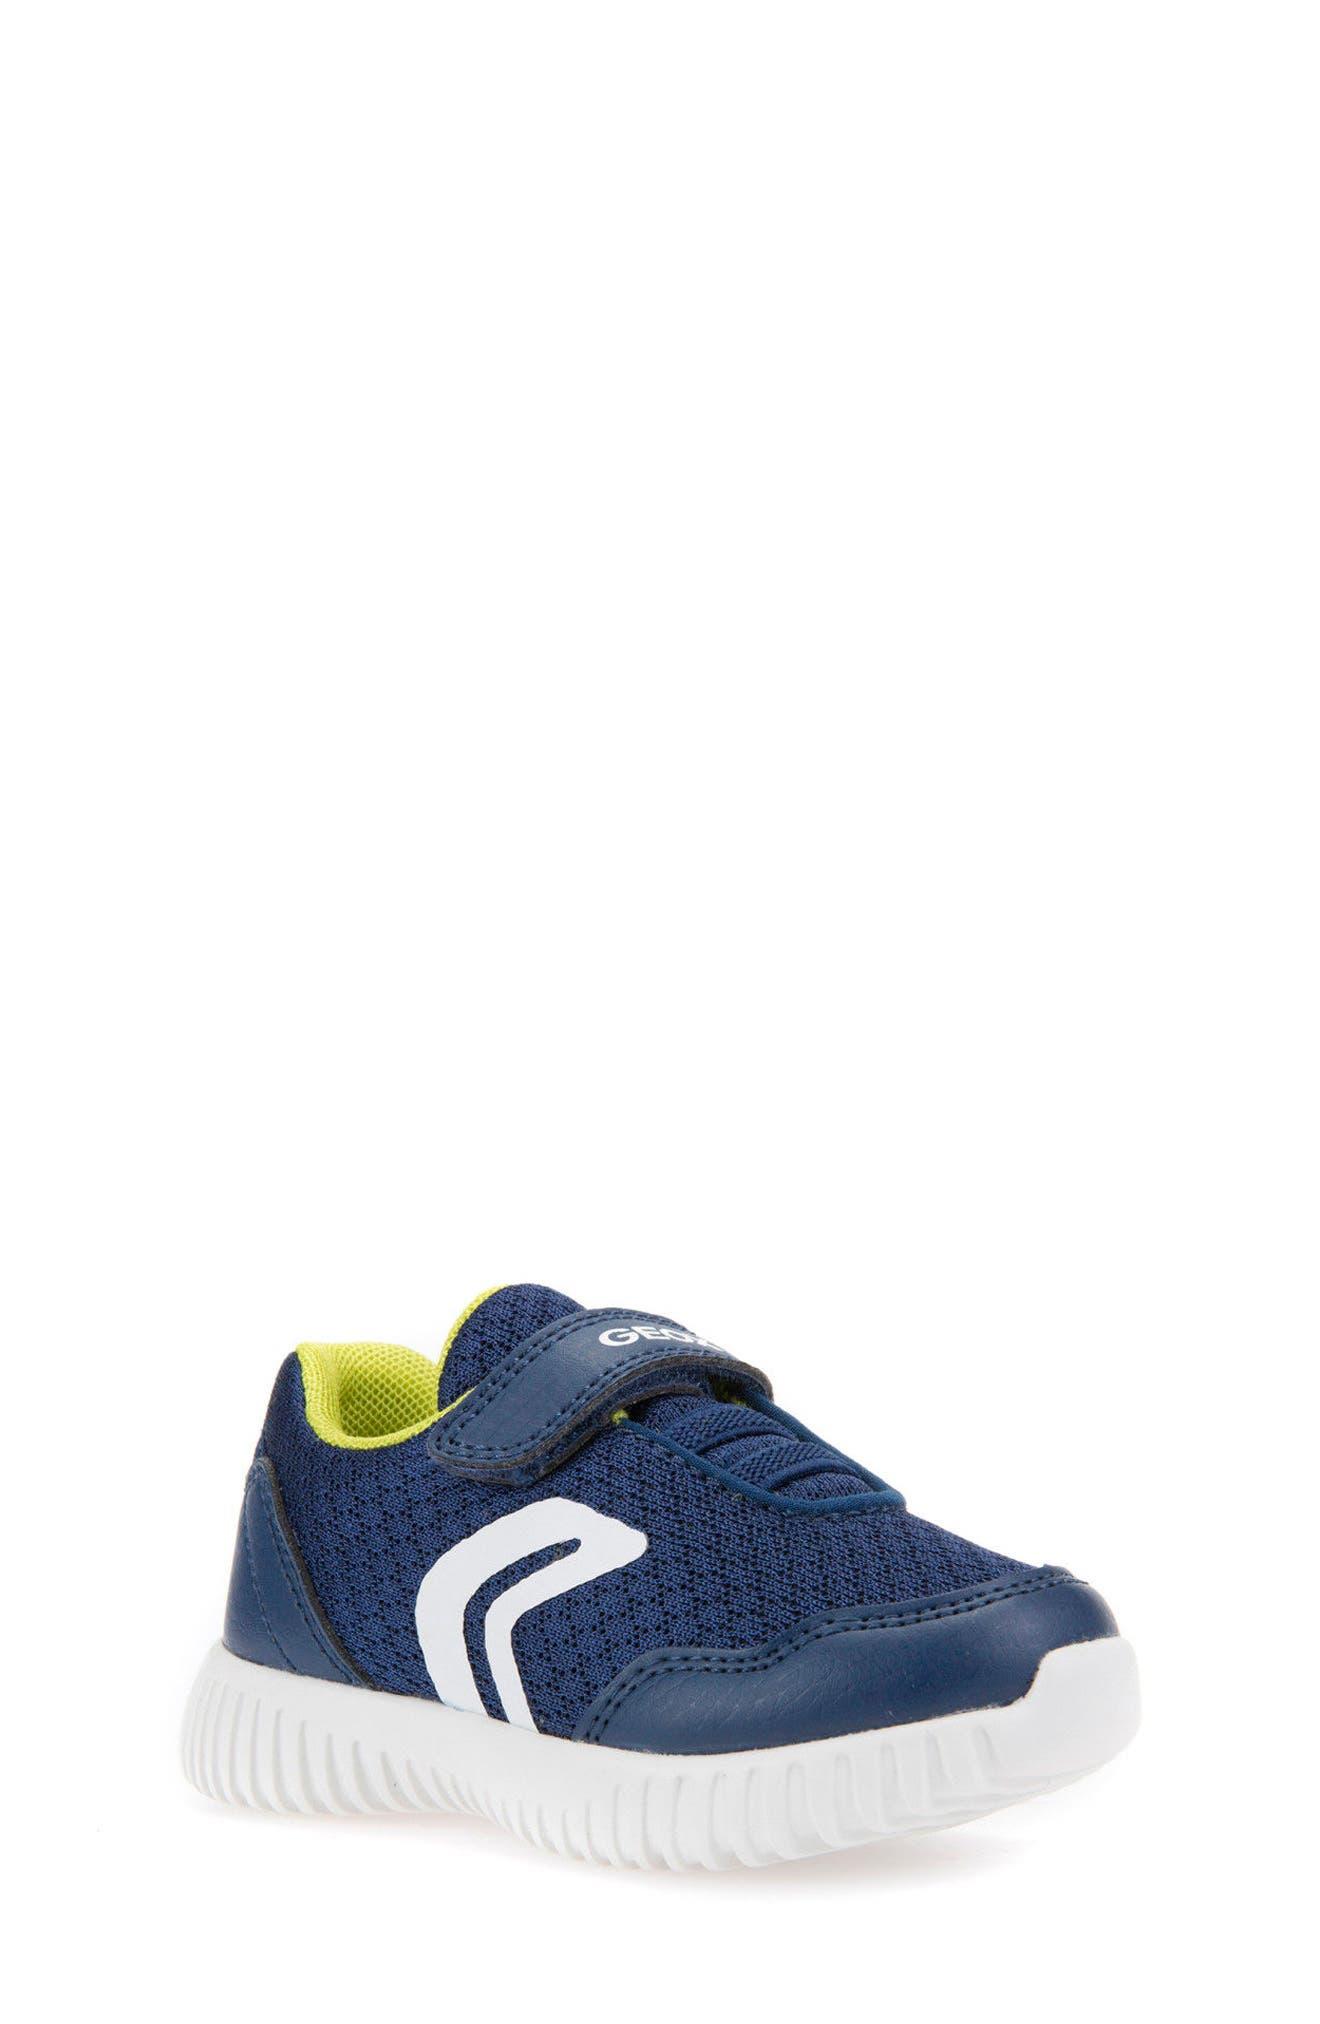 Main Image - Geox Waviness Sneaker (Walker & Toddler)